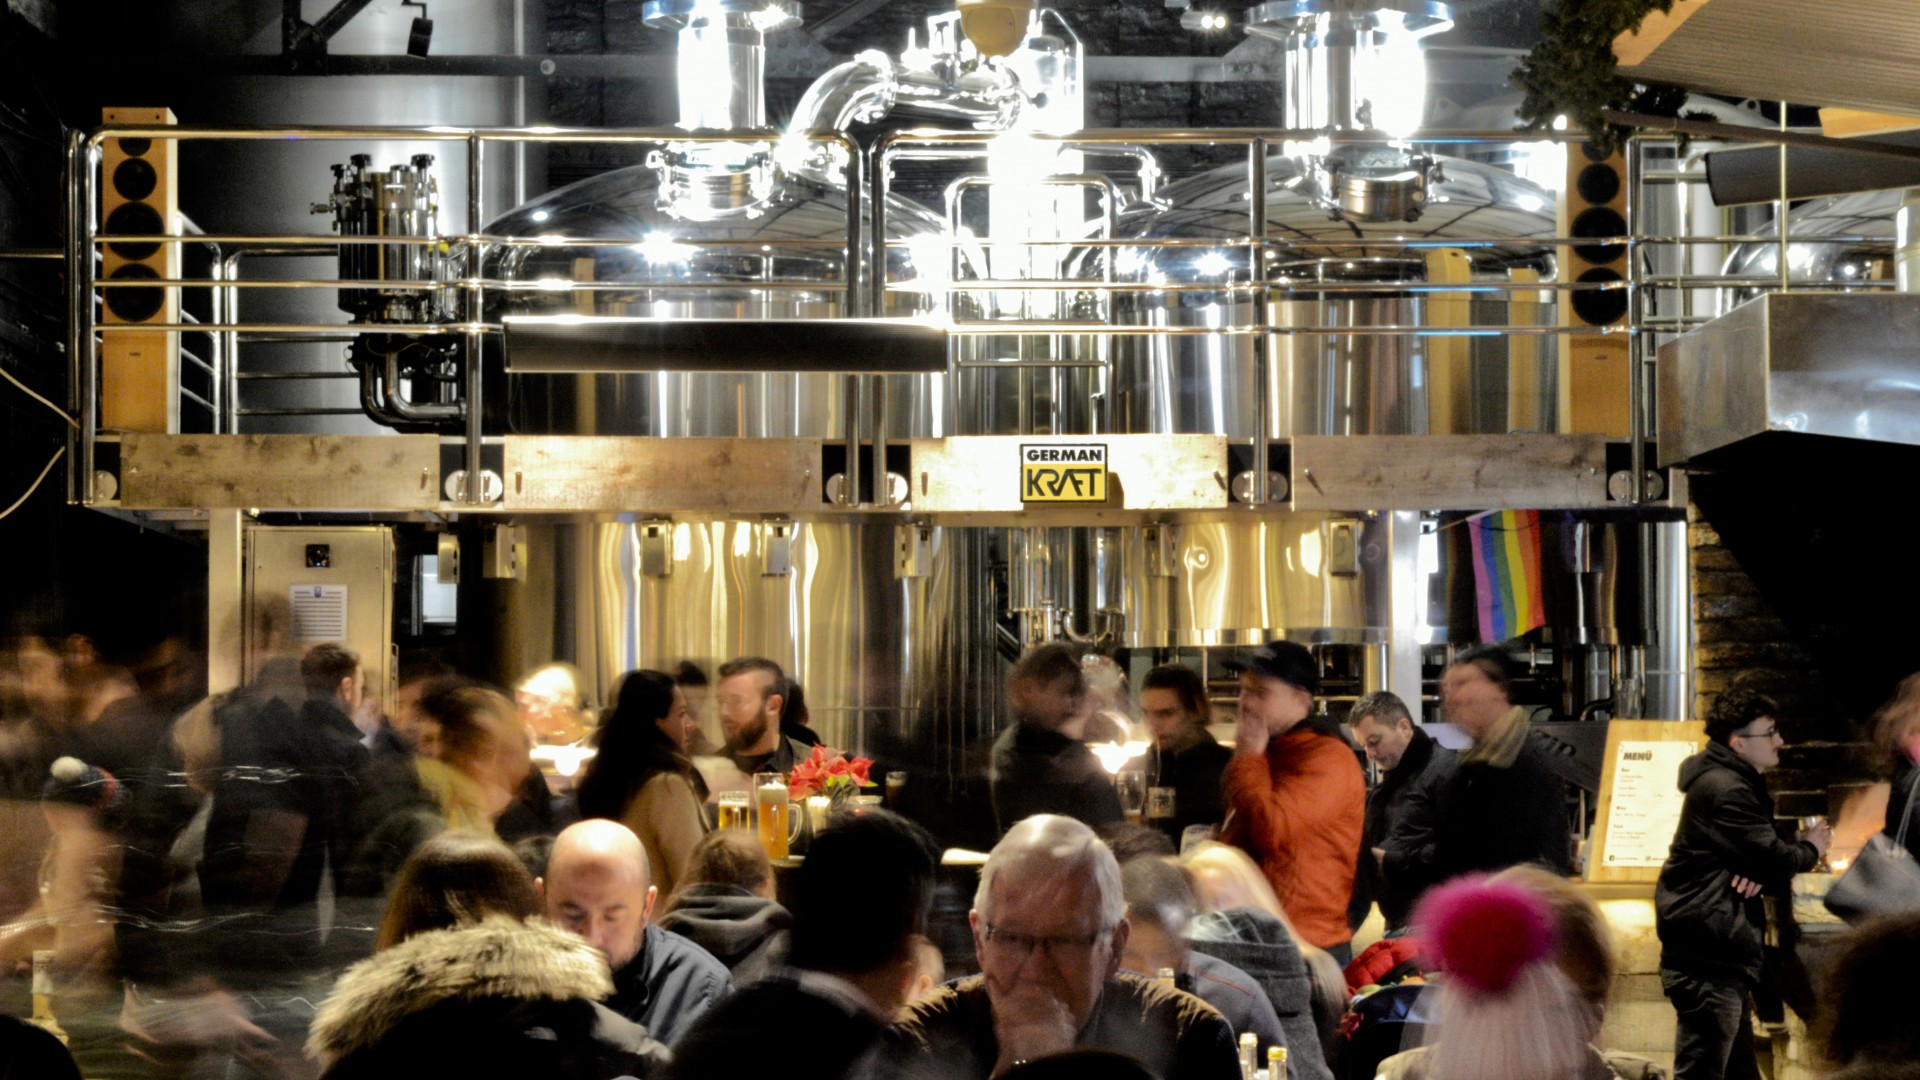 Drinking at German Kraft brewery